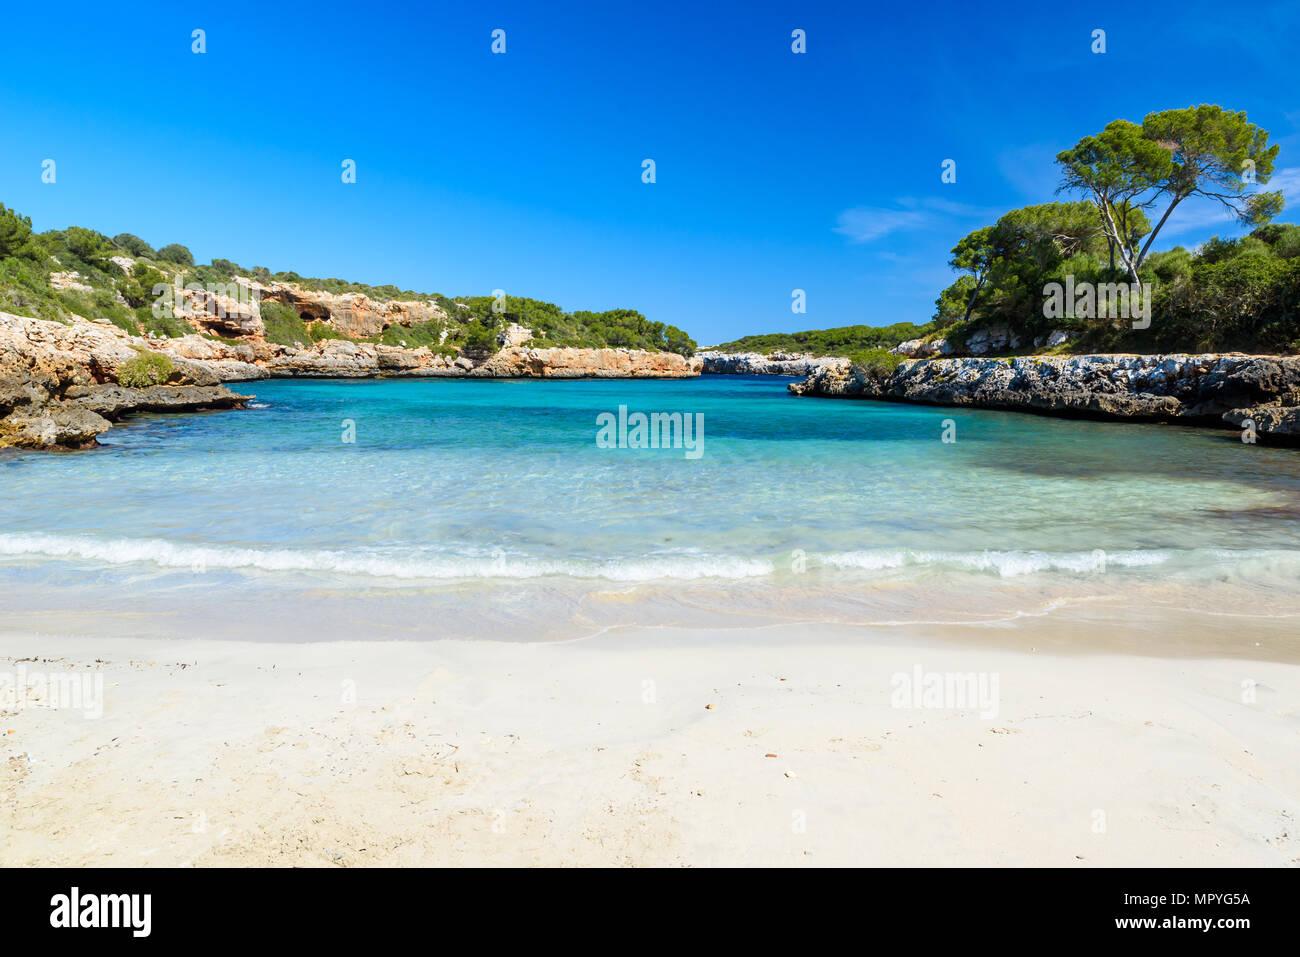 Cala Sa Nau - beautiful bay and beach on Mallorca, Spain - Europe - Stock Image